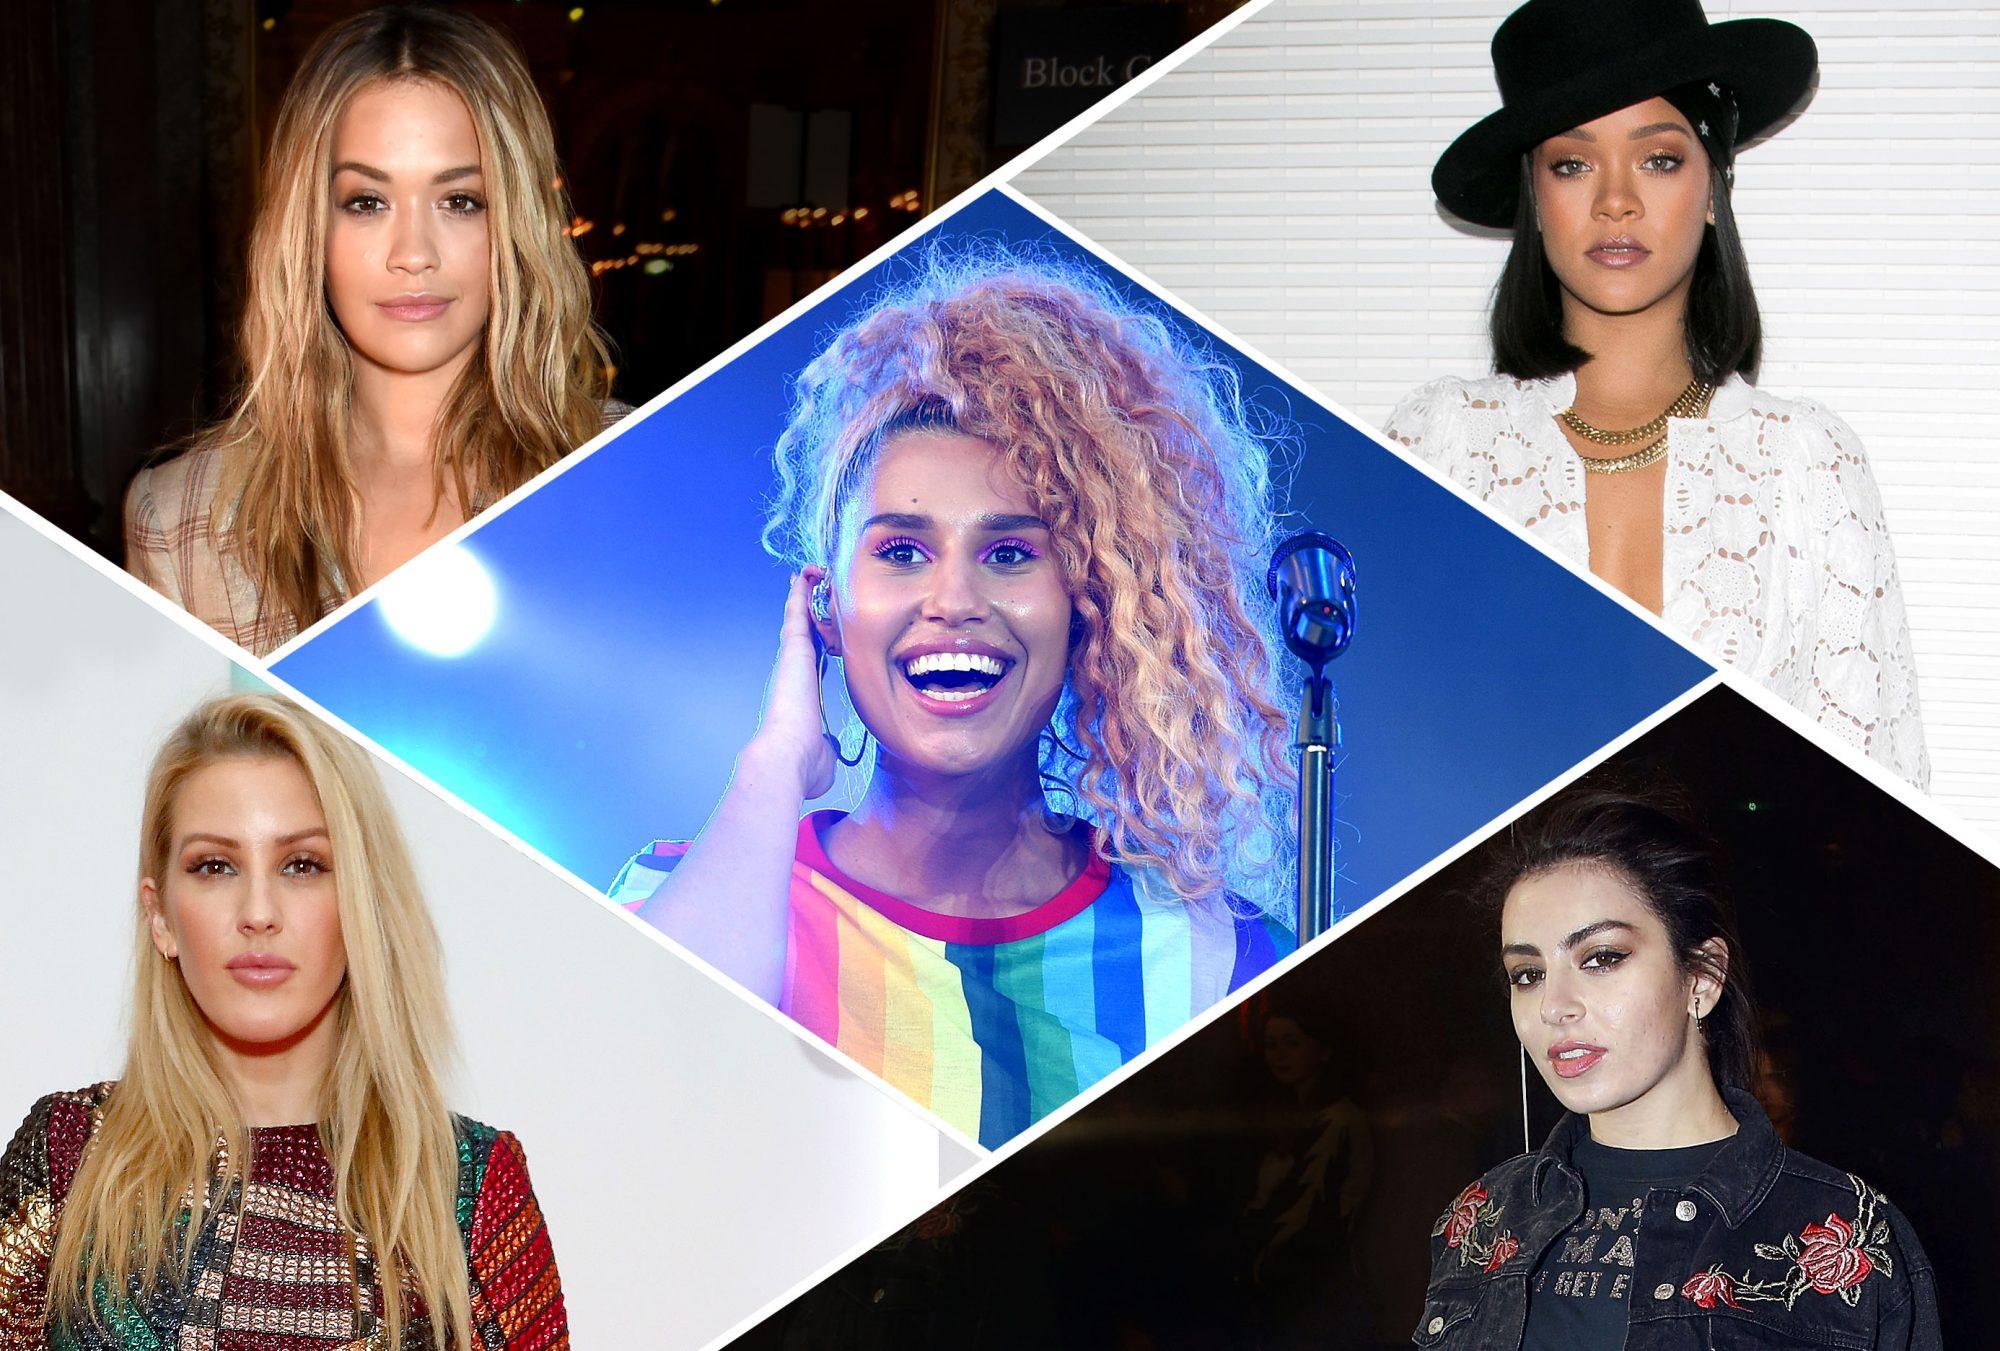 Rita Ora, Rihanna, Charli XCX, Ellie Goulding and RAYE